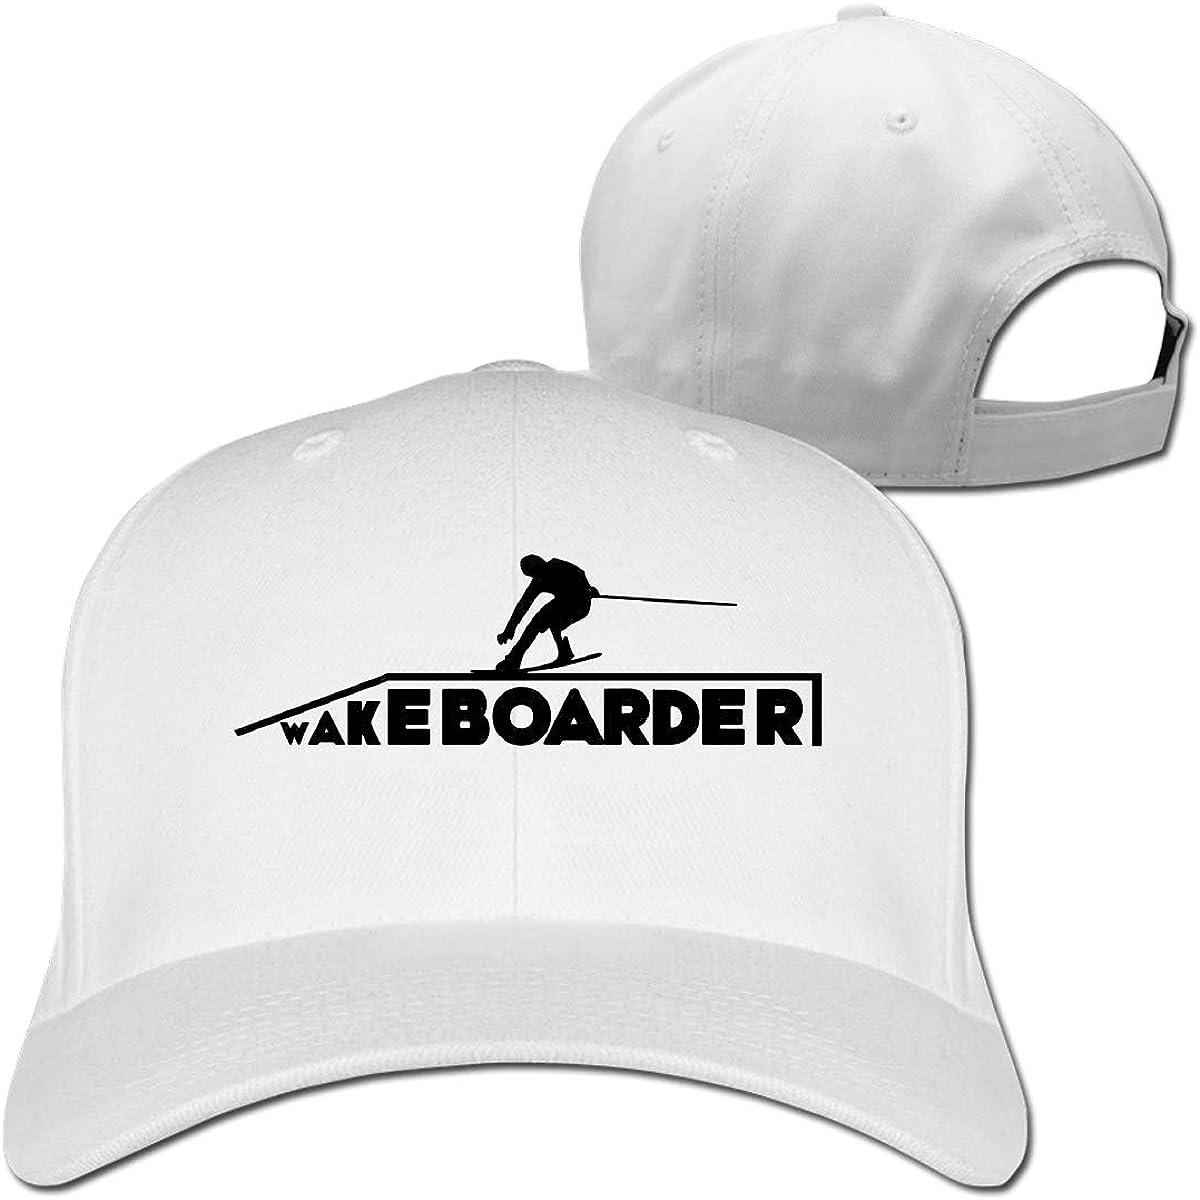 Wakeboarder//Kiteboard Fashion Adjustable Cotton Baseball Caps Trucker Driver Hat Outdoor Cap White